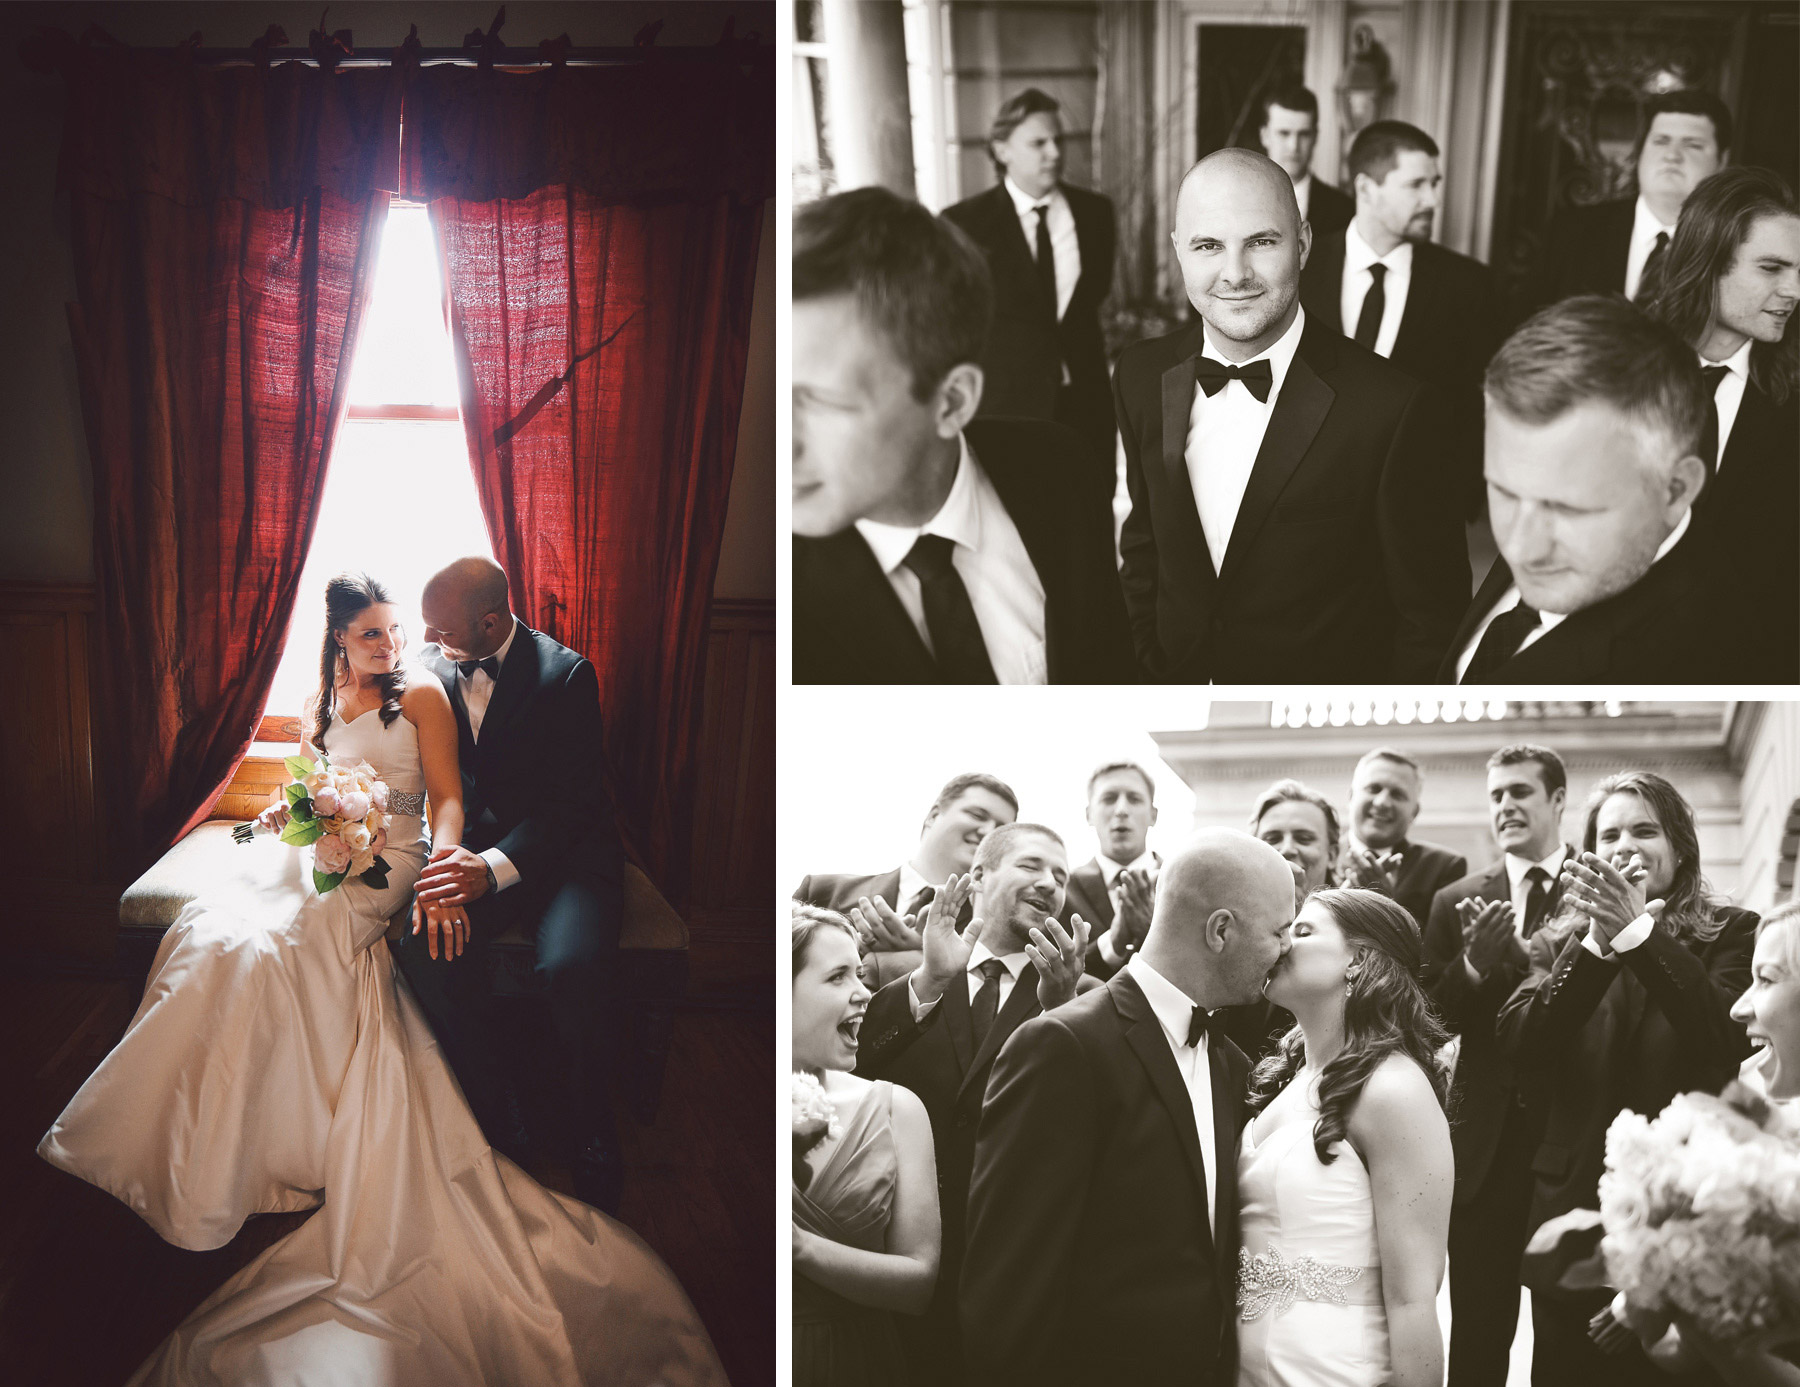 06-Minneapolis-Minnesota-Wedding-Photography-by-Vick-Photography-Semple-Mansion-Nikki-and-Matt.jpg